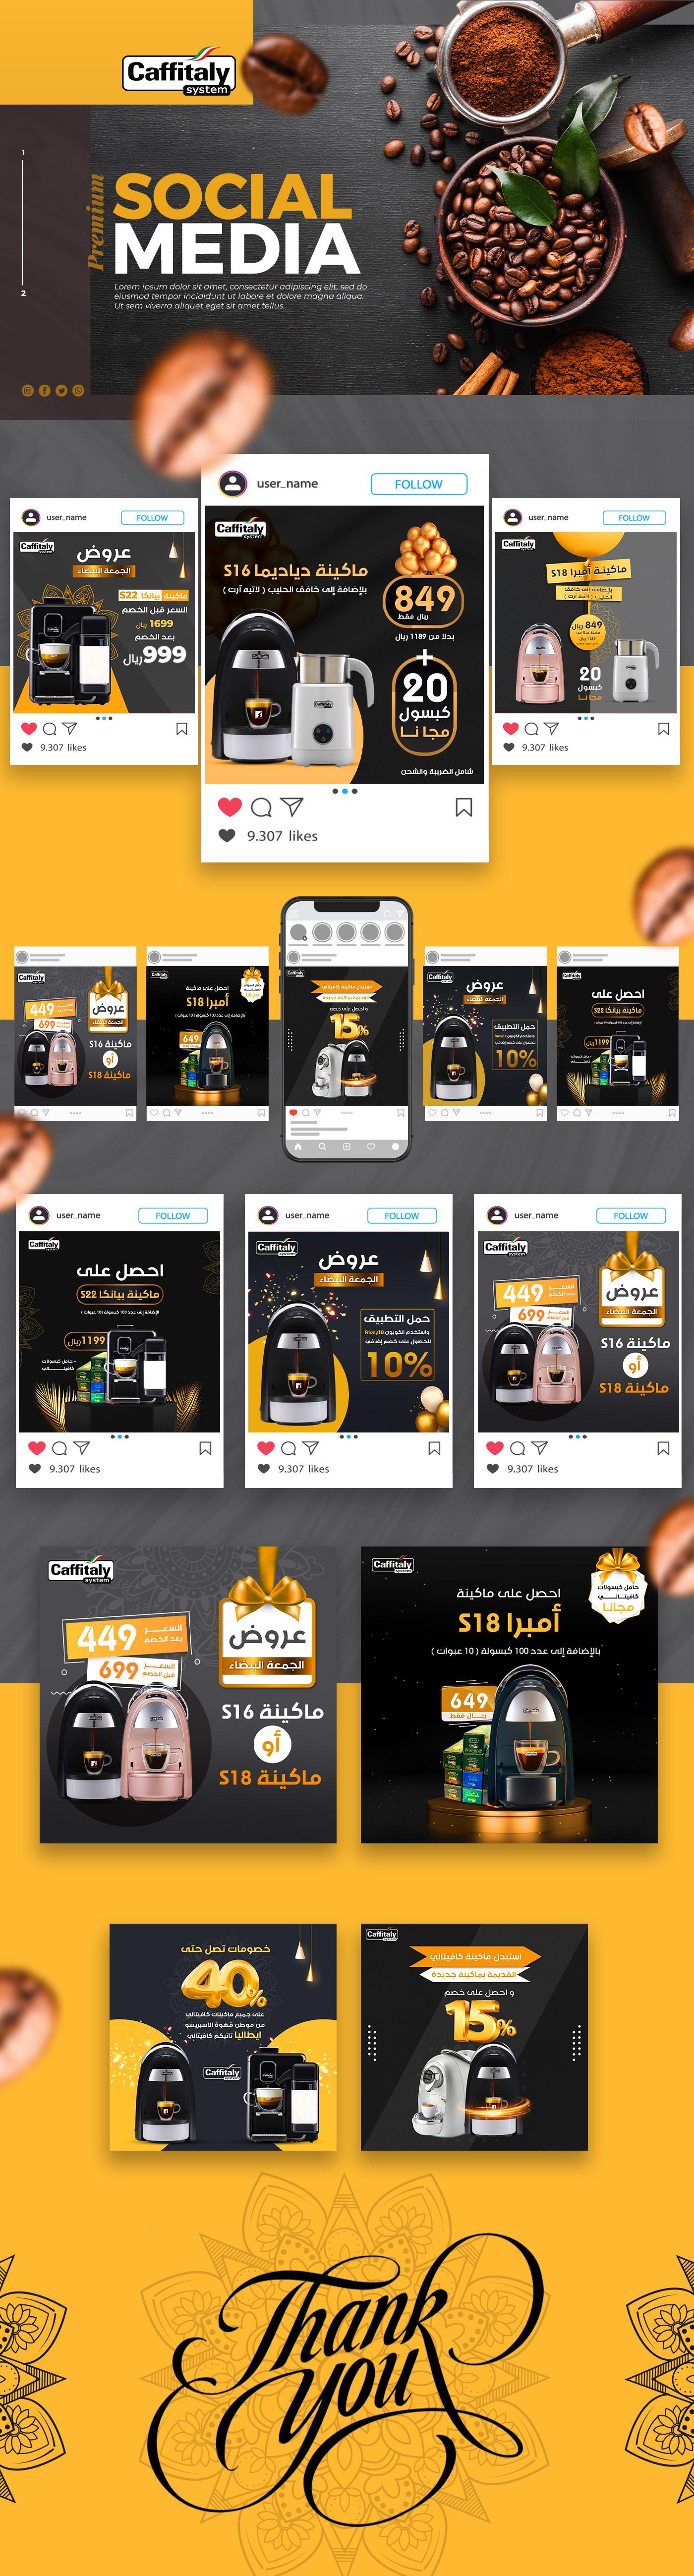 ads advertisment cafe Coffee design graphic machine social social media